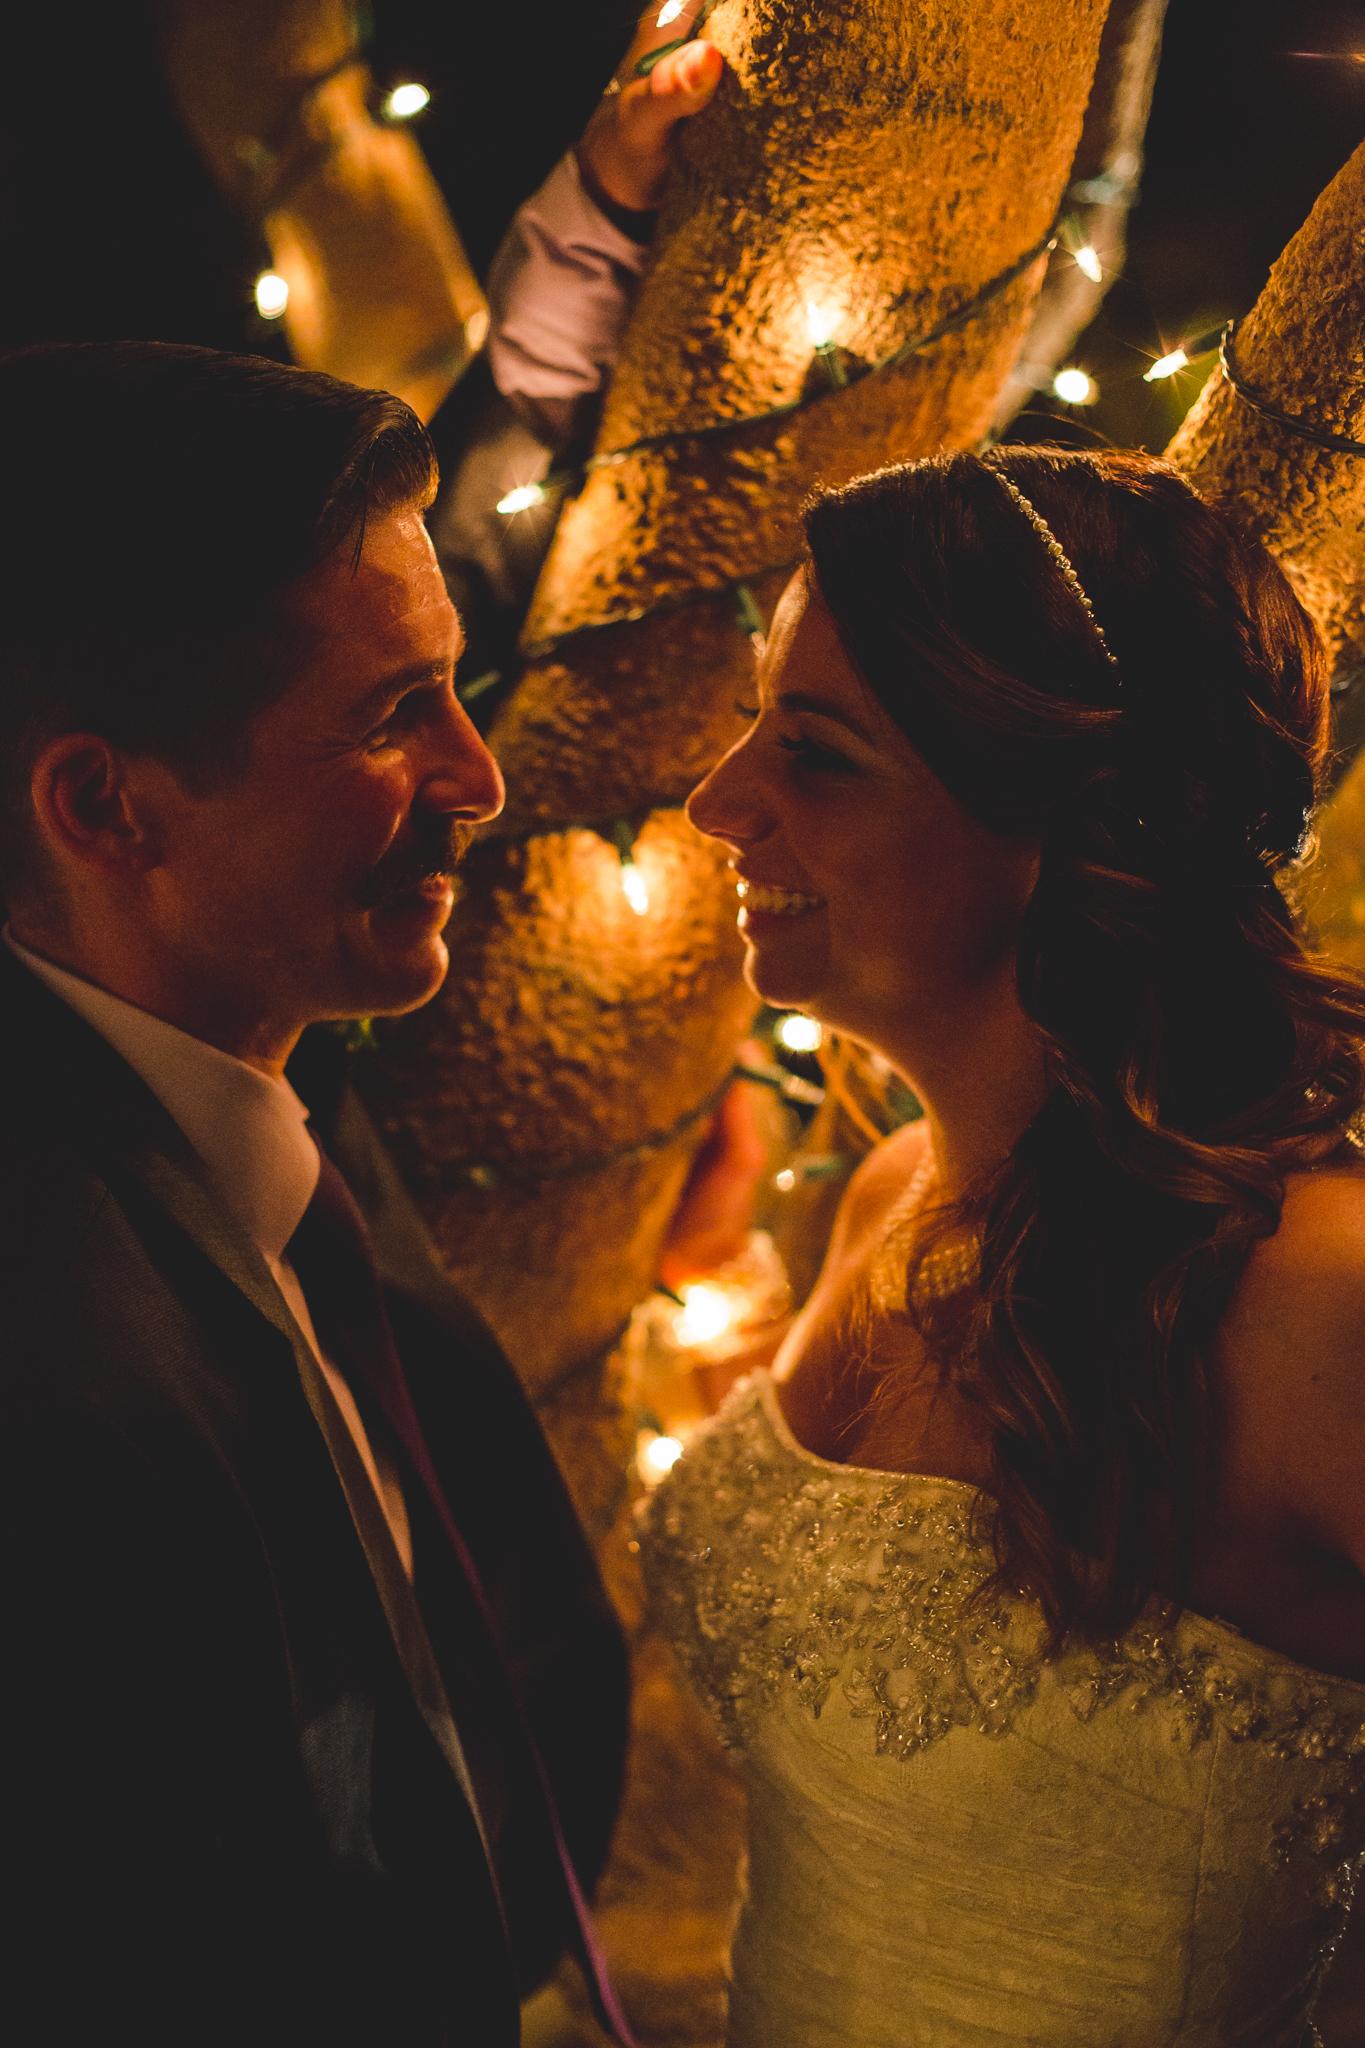 aaron kes photography camelback inn wedding romantic twinkle lights photo